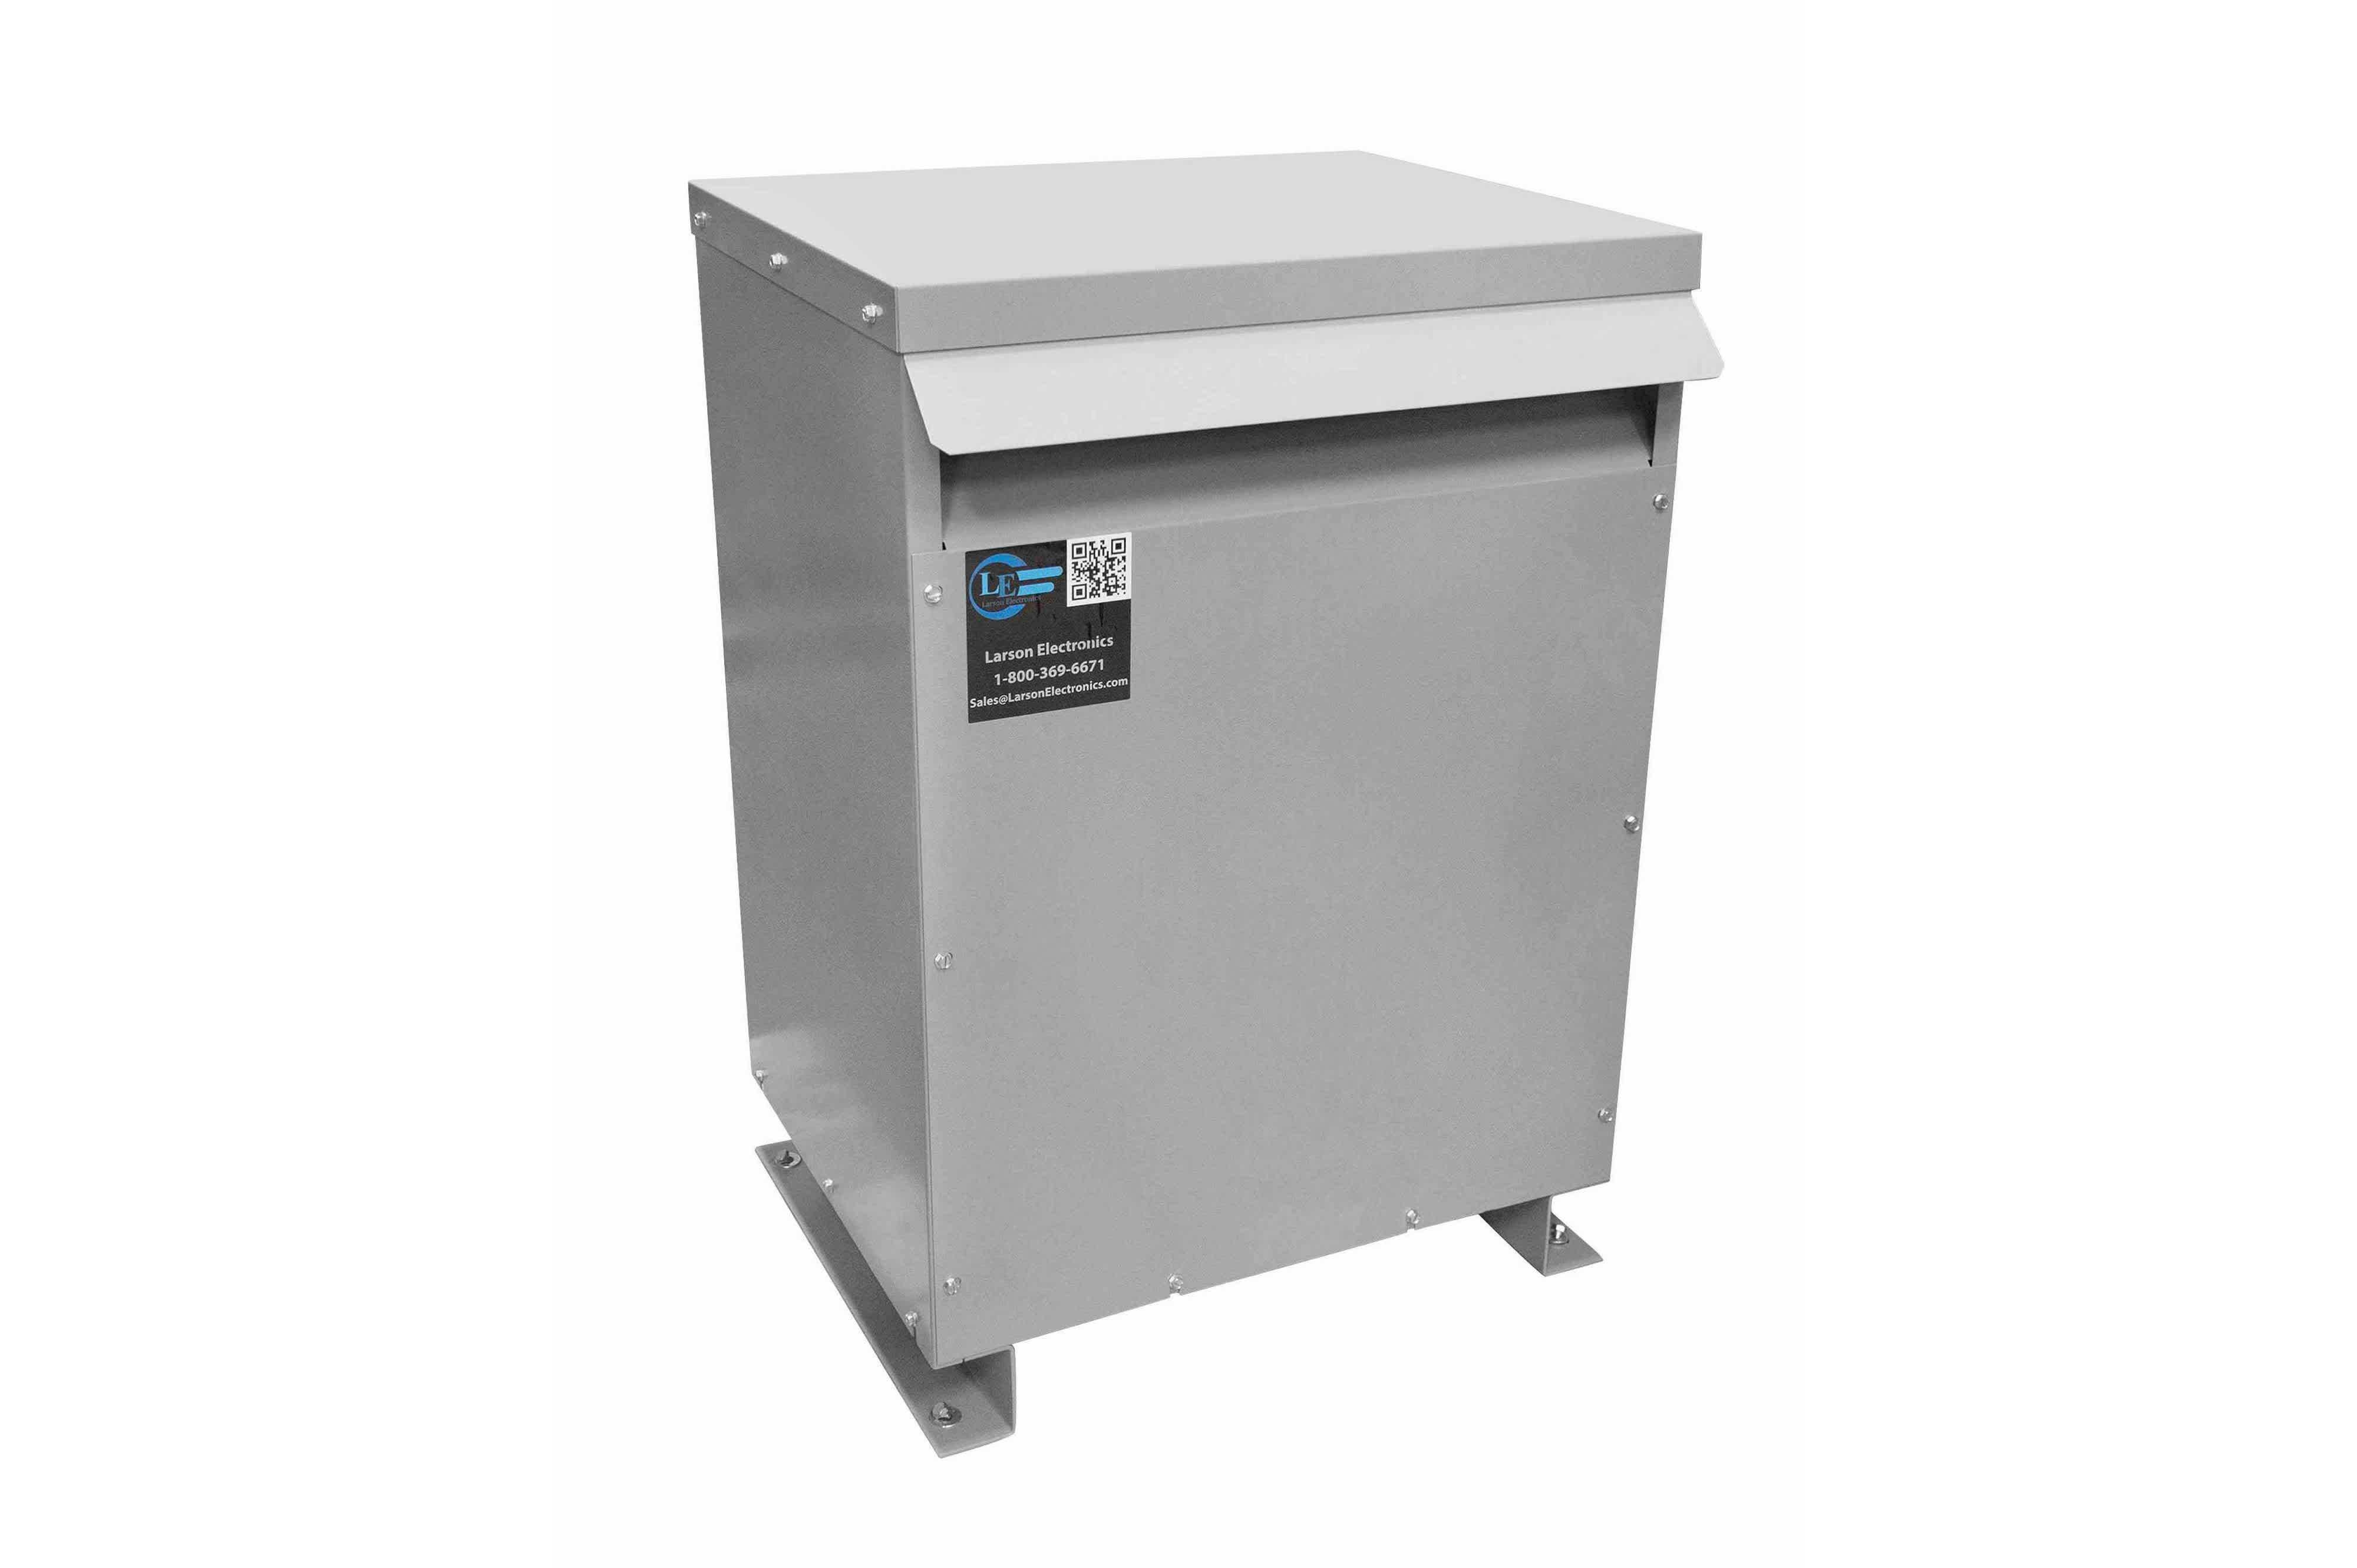 11 kVA 3PH Isolation Transformer, 575V Wye Primary, 415Y/240 Wye-N Secondary, N3R, Ventilated, 60 Hz